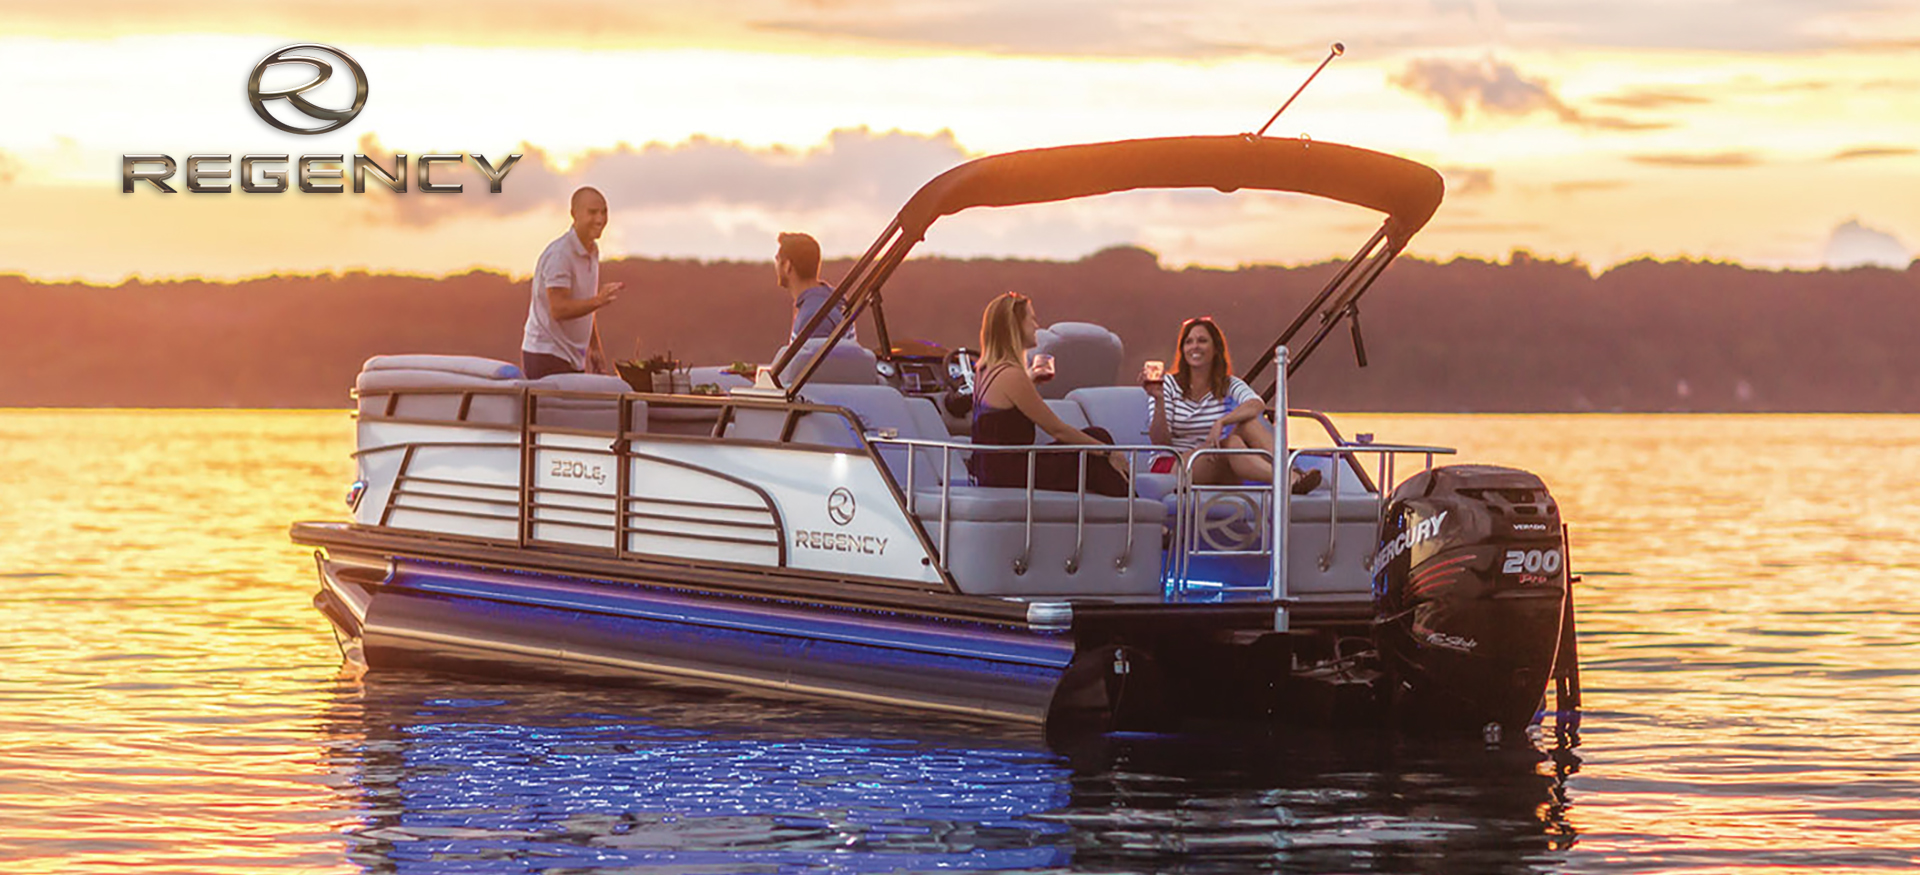 Regency pontoon boat